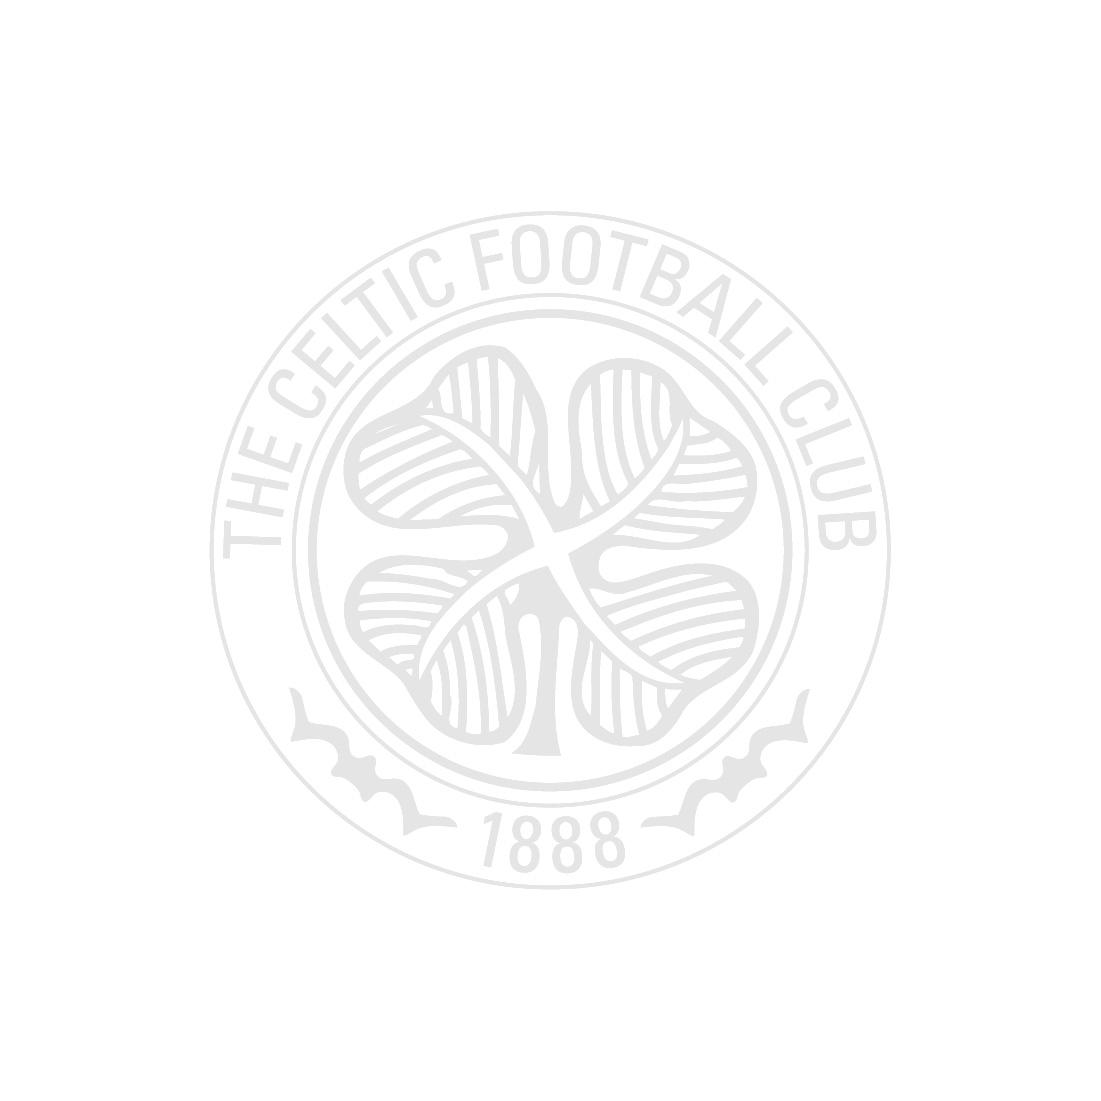 Celtic Bootbag